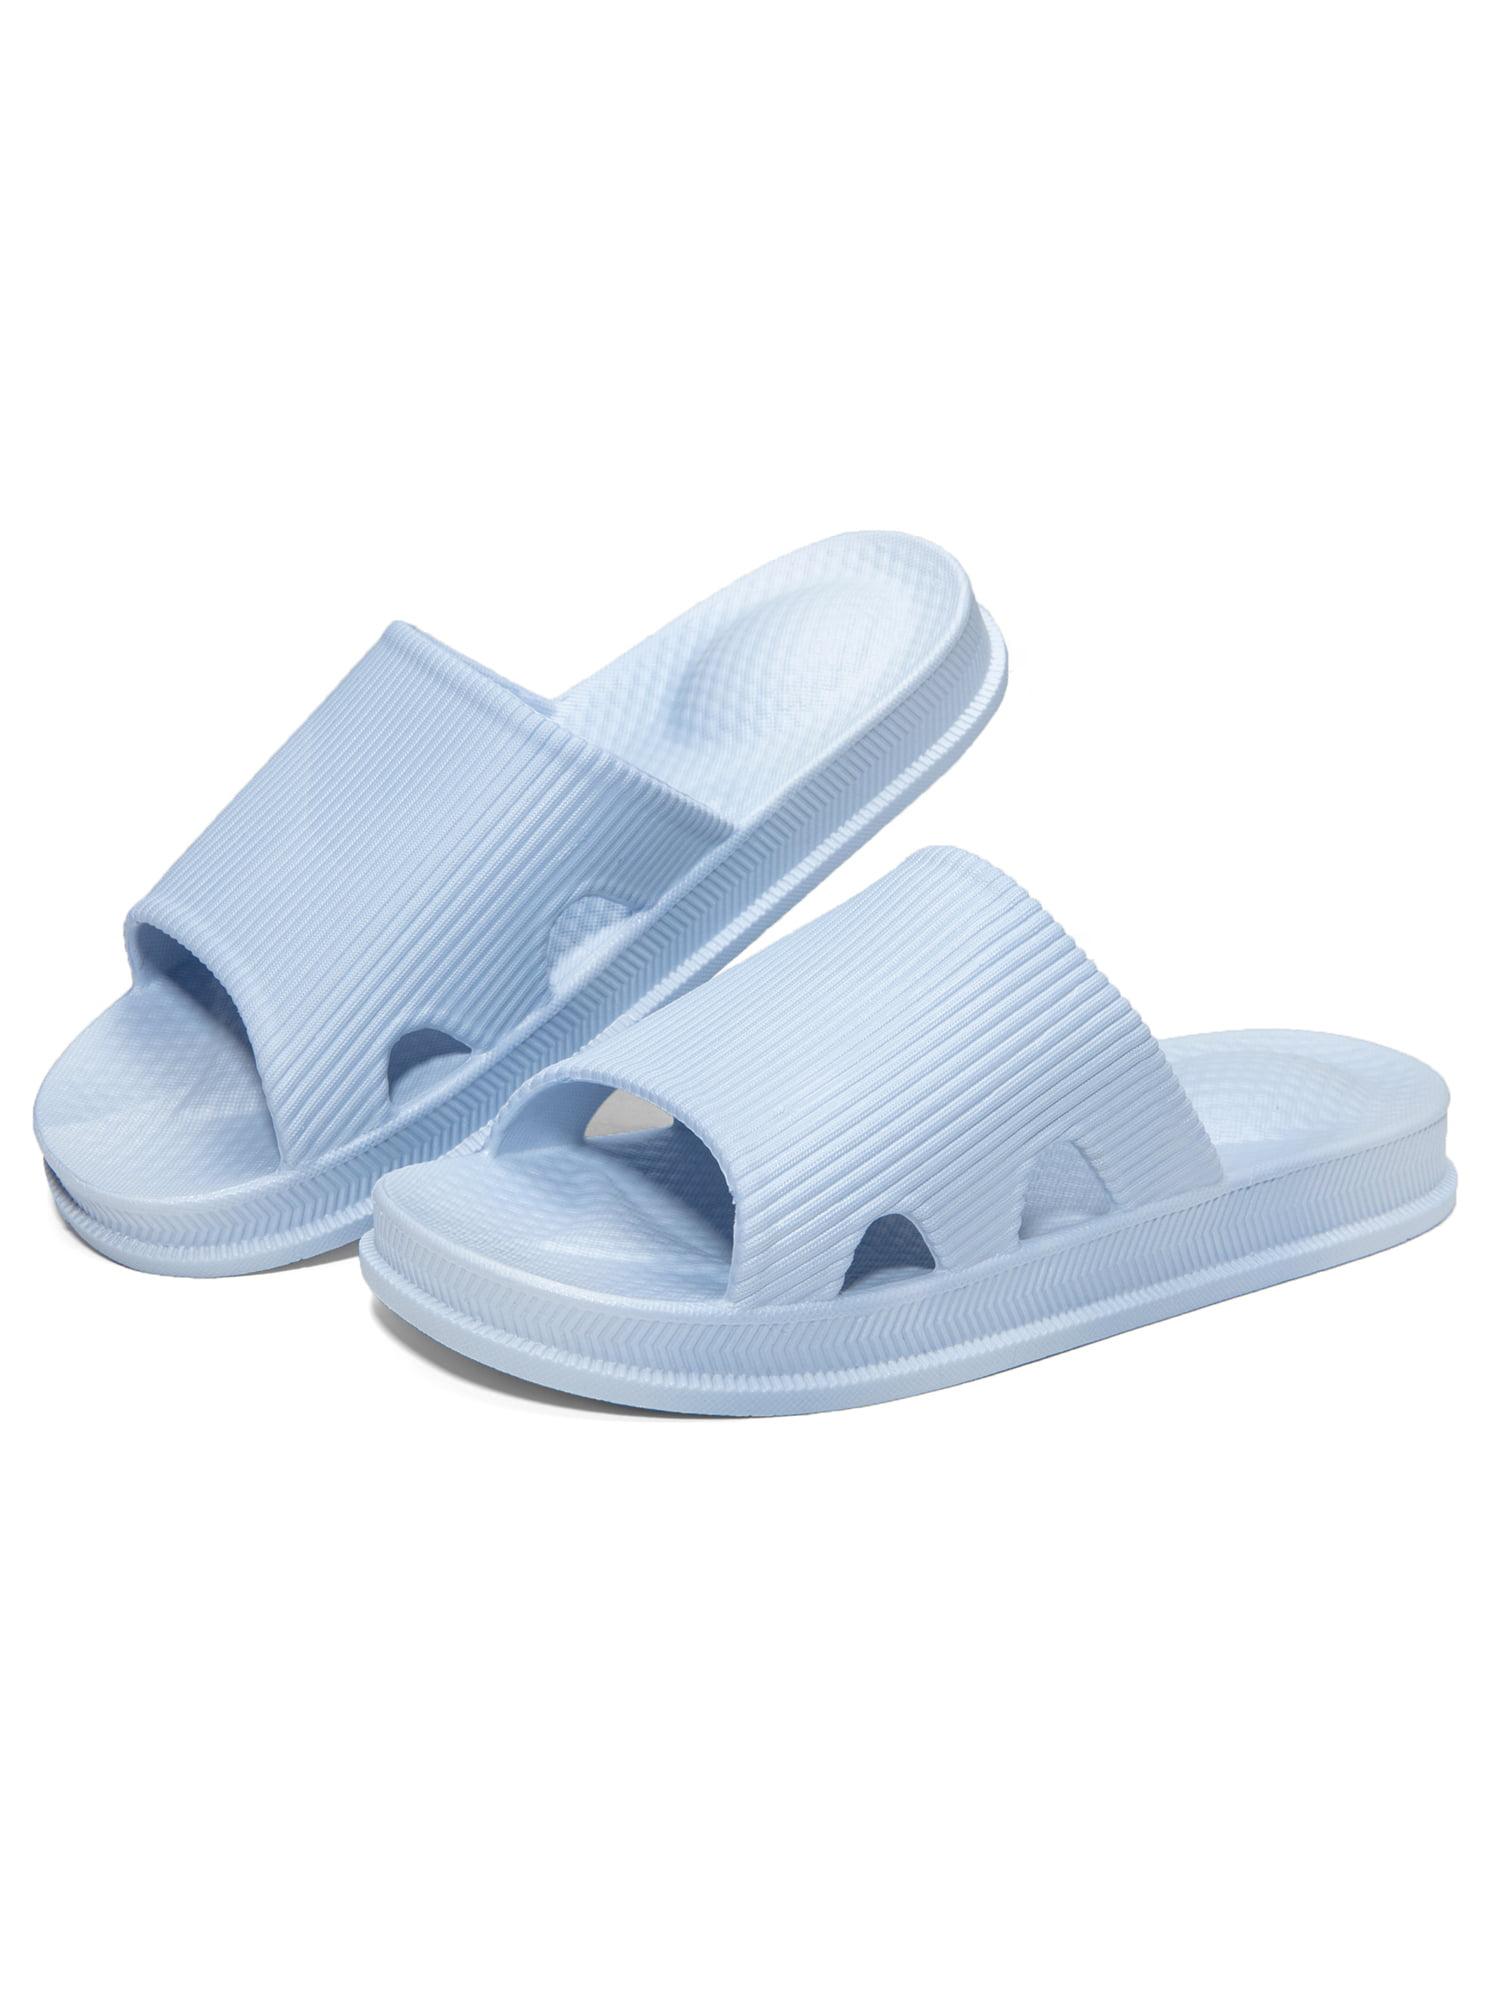 Shower Slippers Spa Slide Sandals